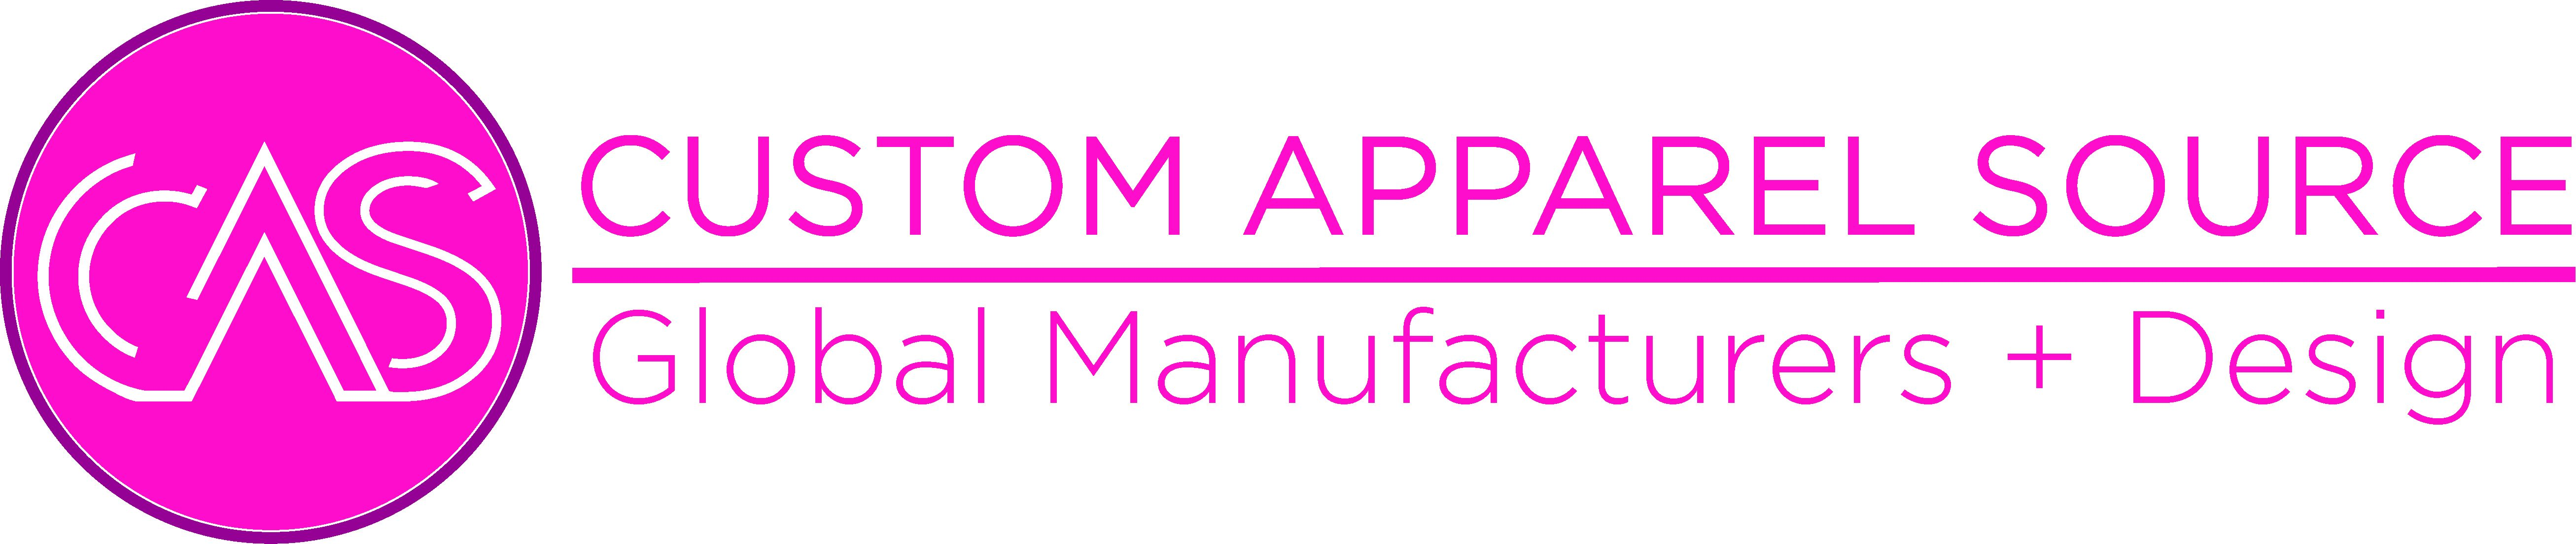 Custom Apparel Source